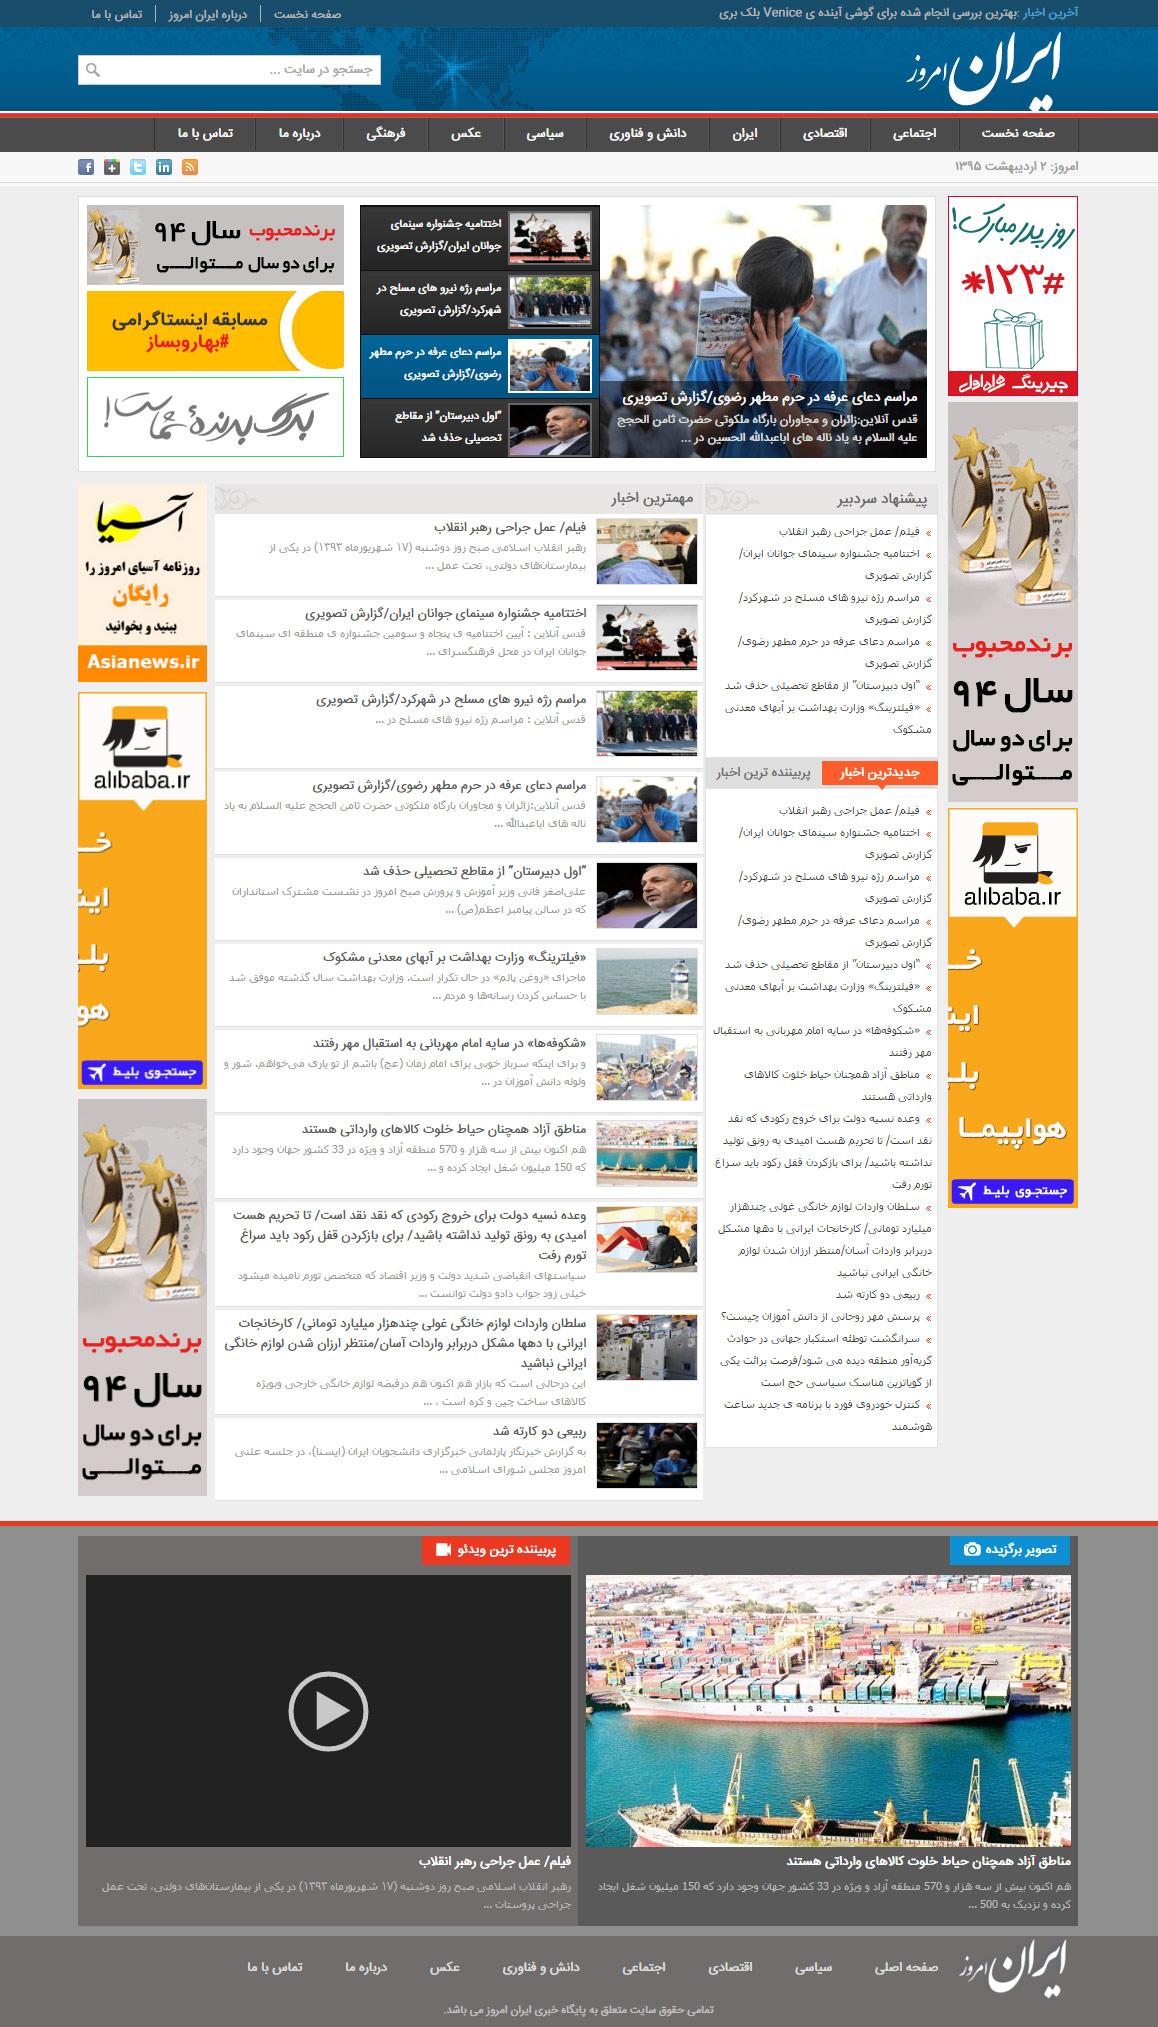 قالب وردپرس خبری ایران امروز   قالب خبری   قالب خبری وردپرس   قالب وردپرس   پوسته خبری